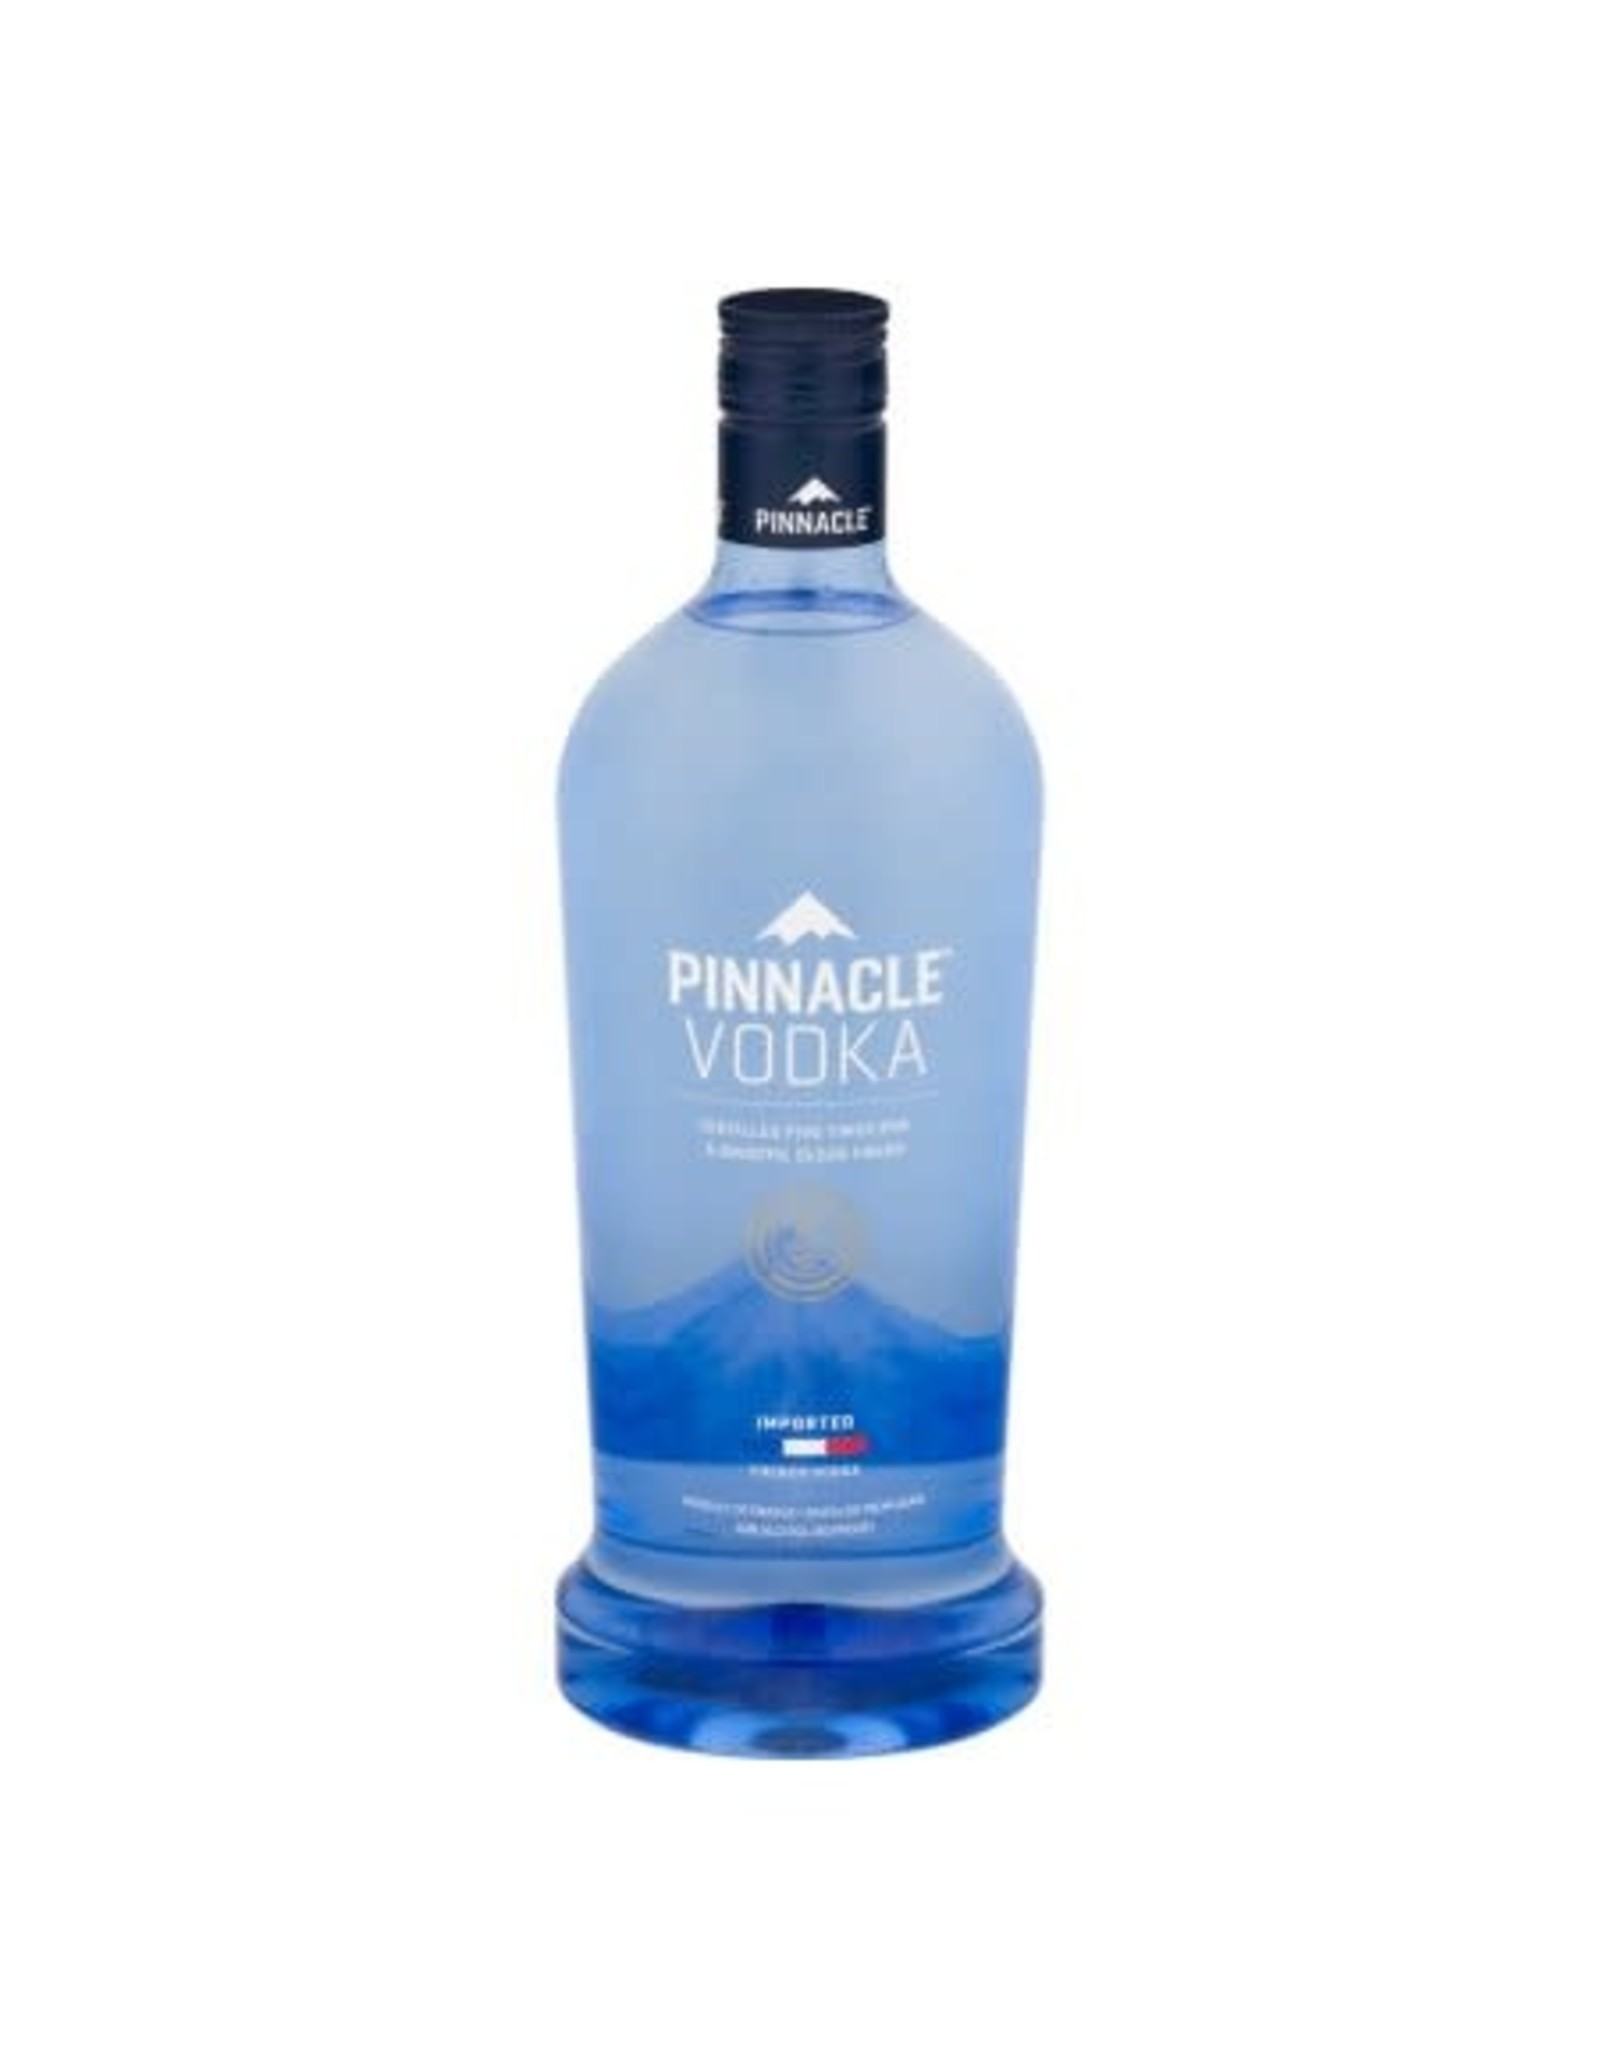 PINNACLE VODKA 1.75L